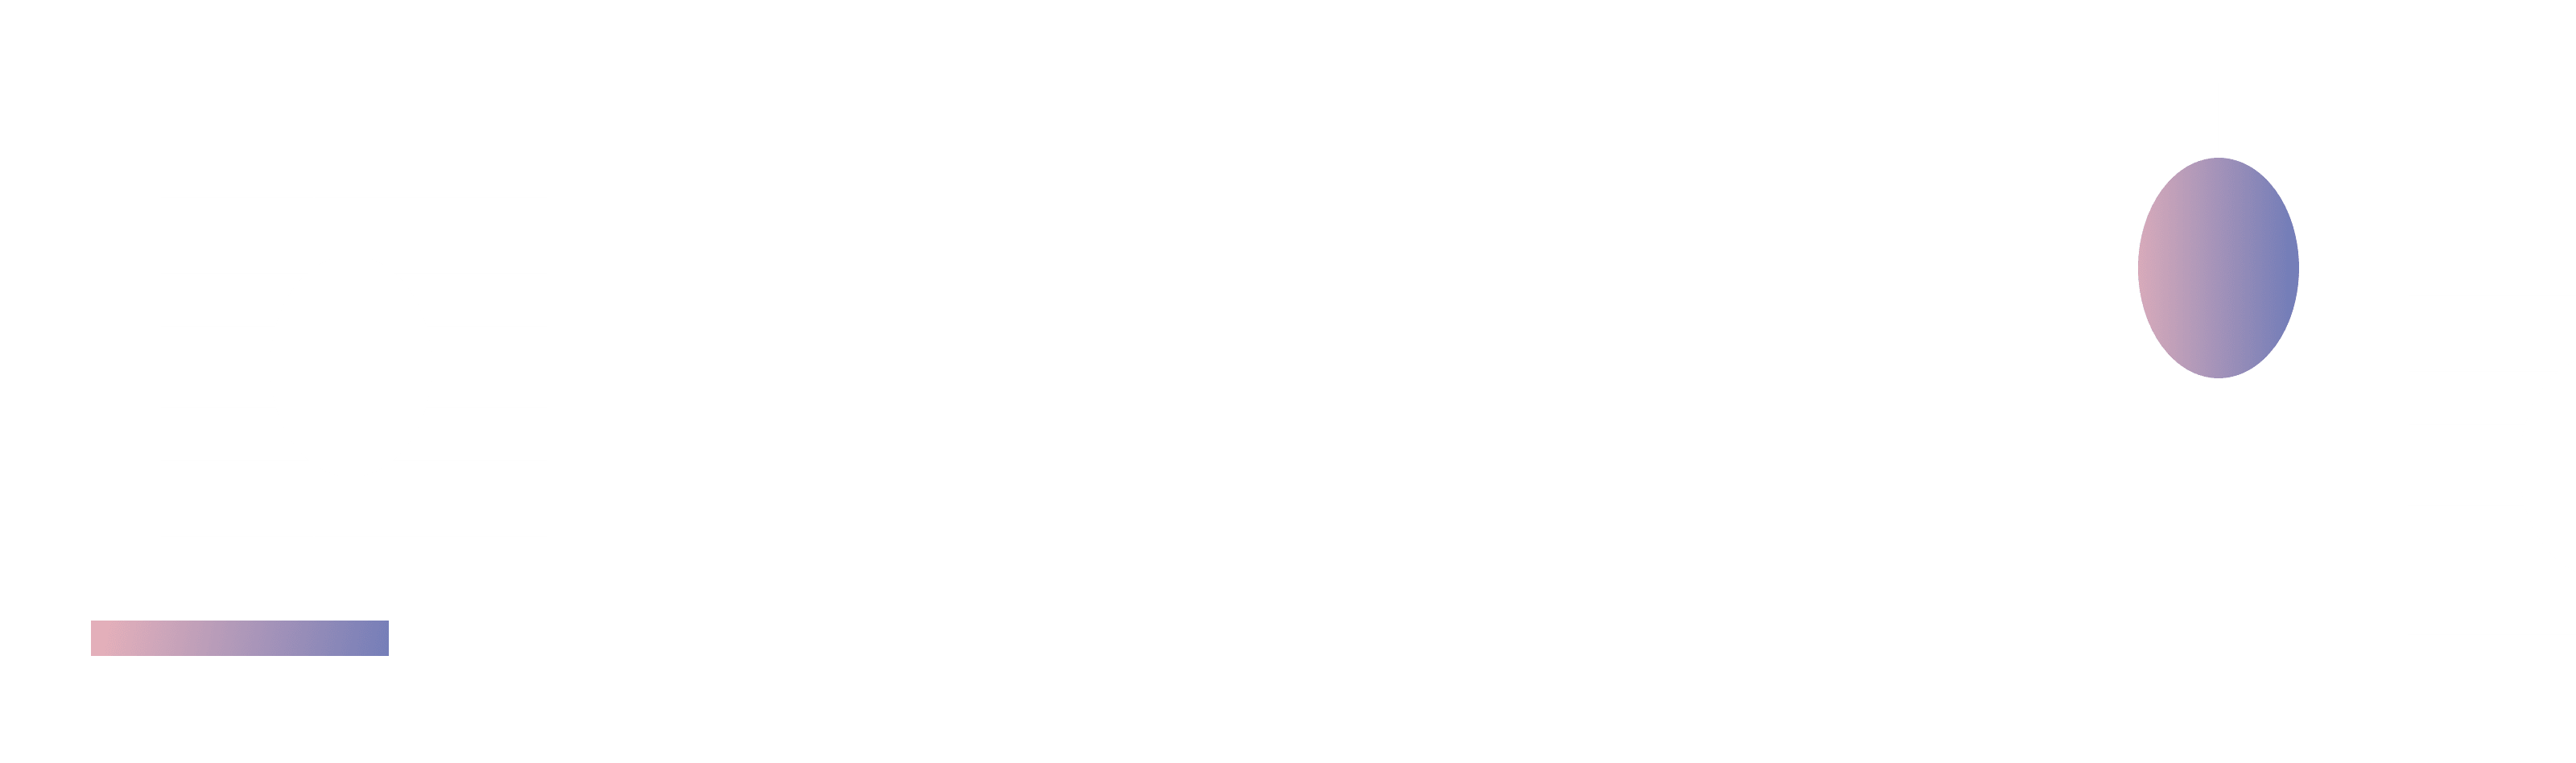 CTA banner 560d693e-badf-49fa-a40c-1b8d4fa06f2a background